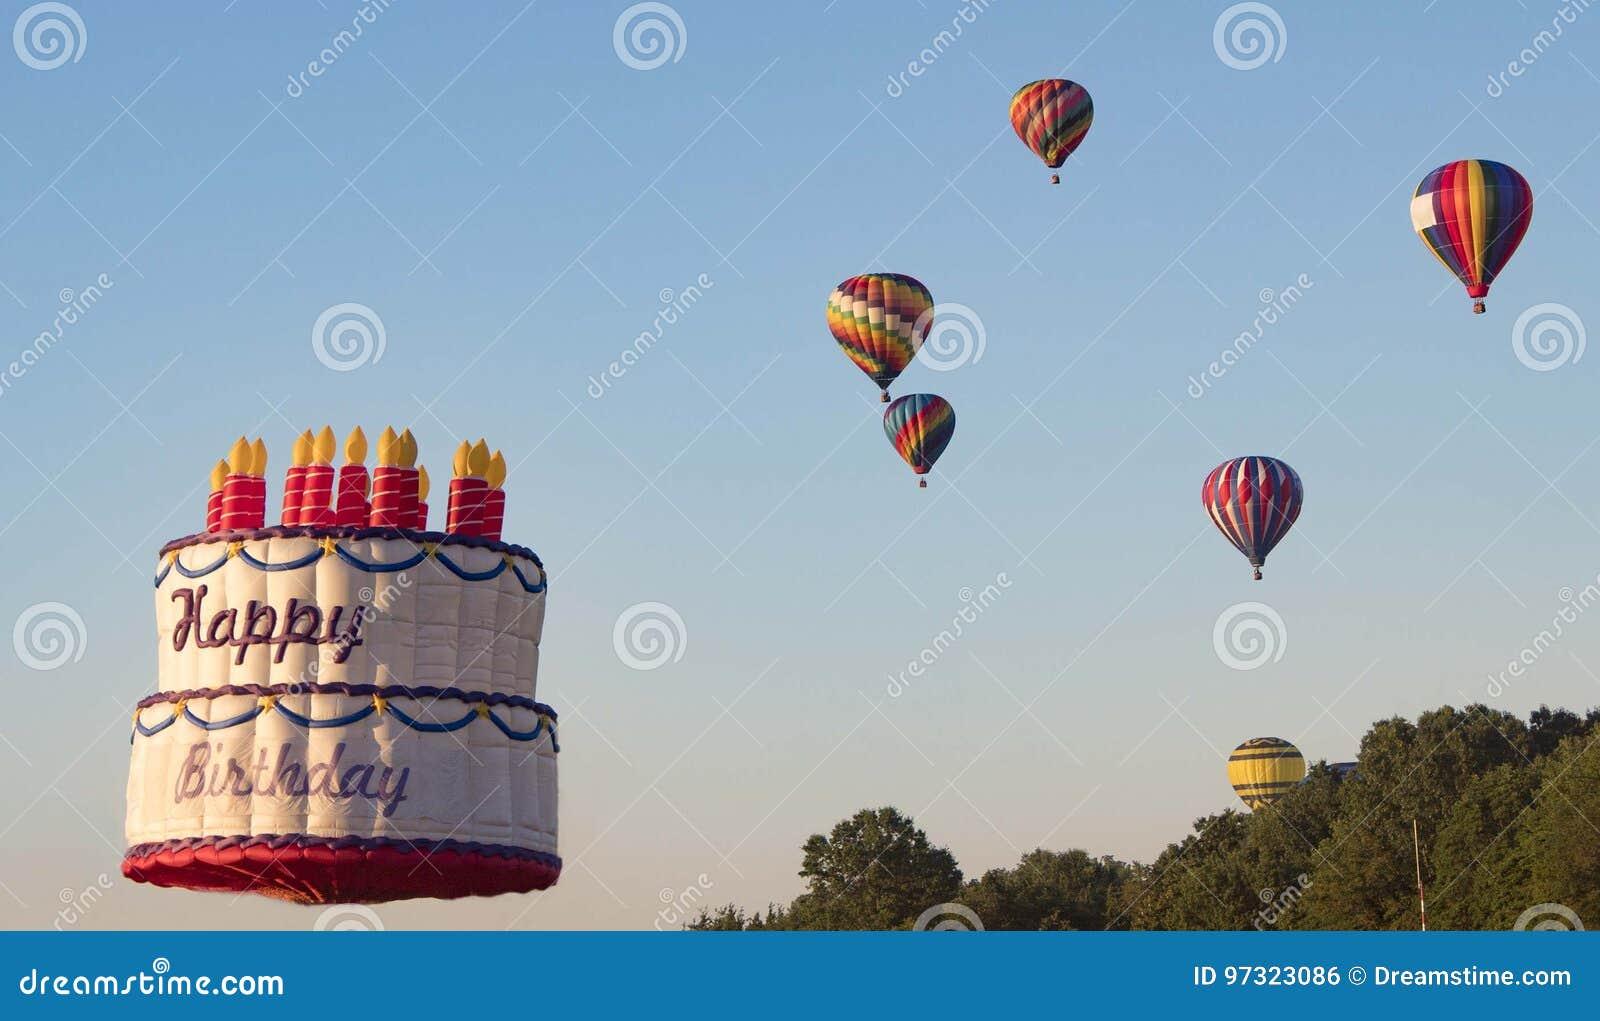 Terrific Birthday Cake Hot Air Balloon Stock Photo Image Of Colorful Funny Birthday Cards Online Necthendildamsfinfo